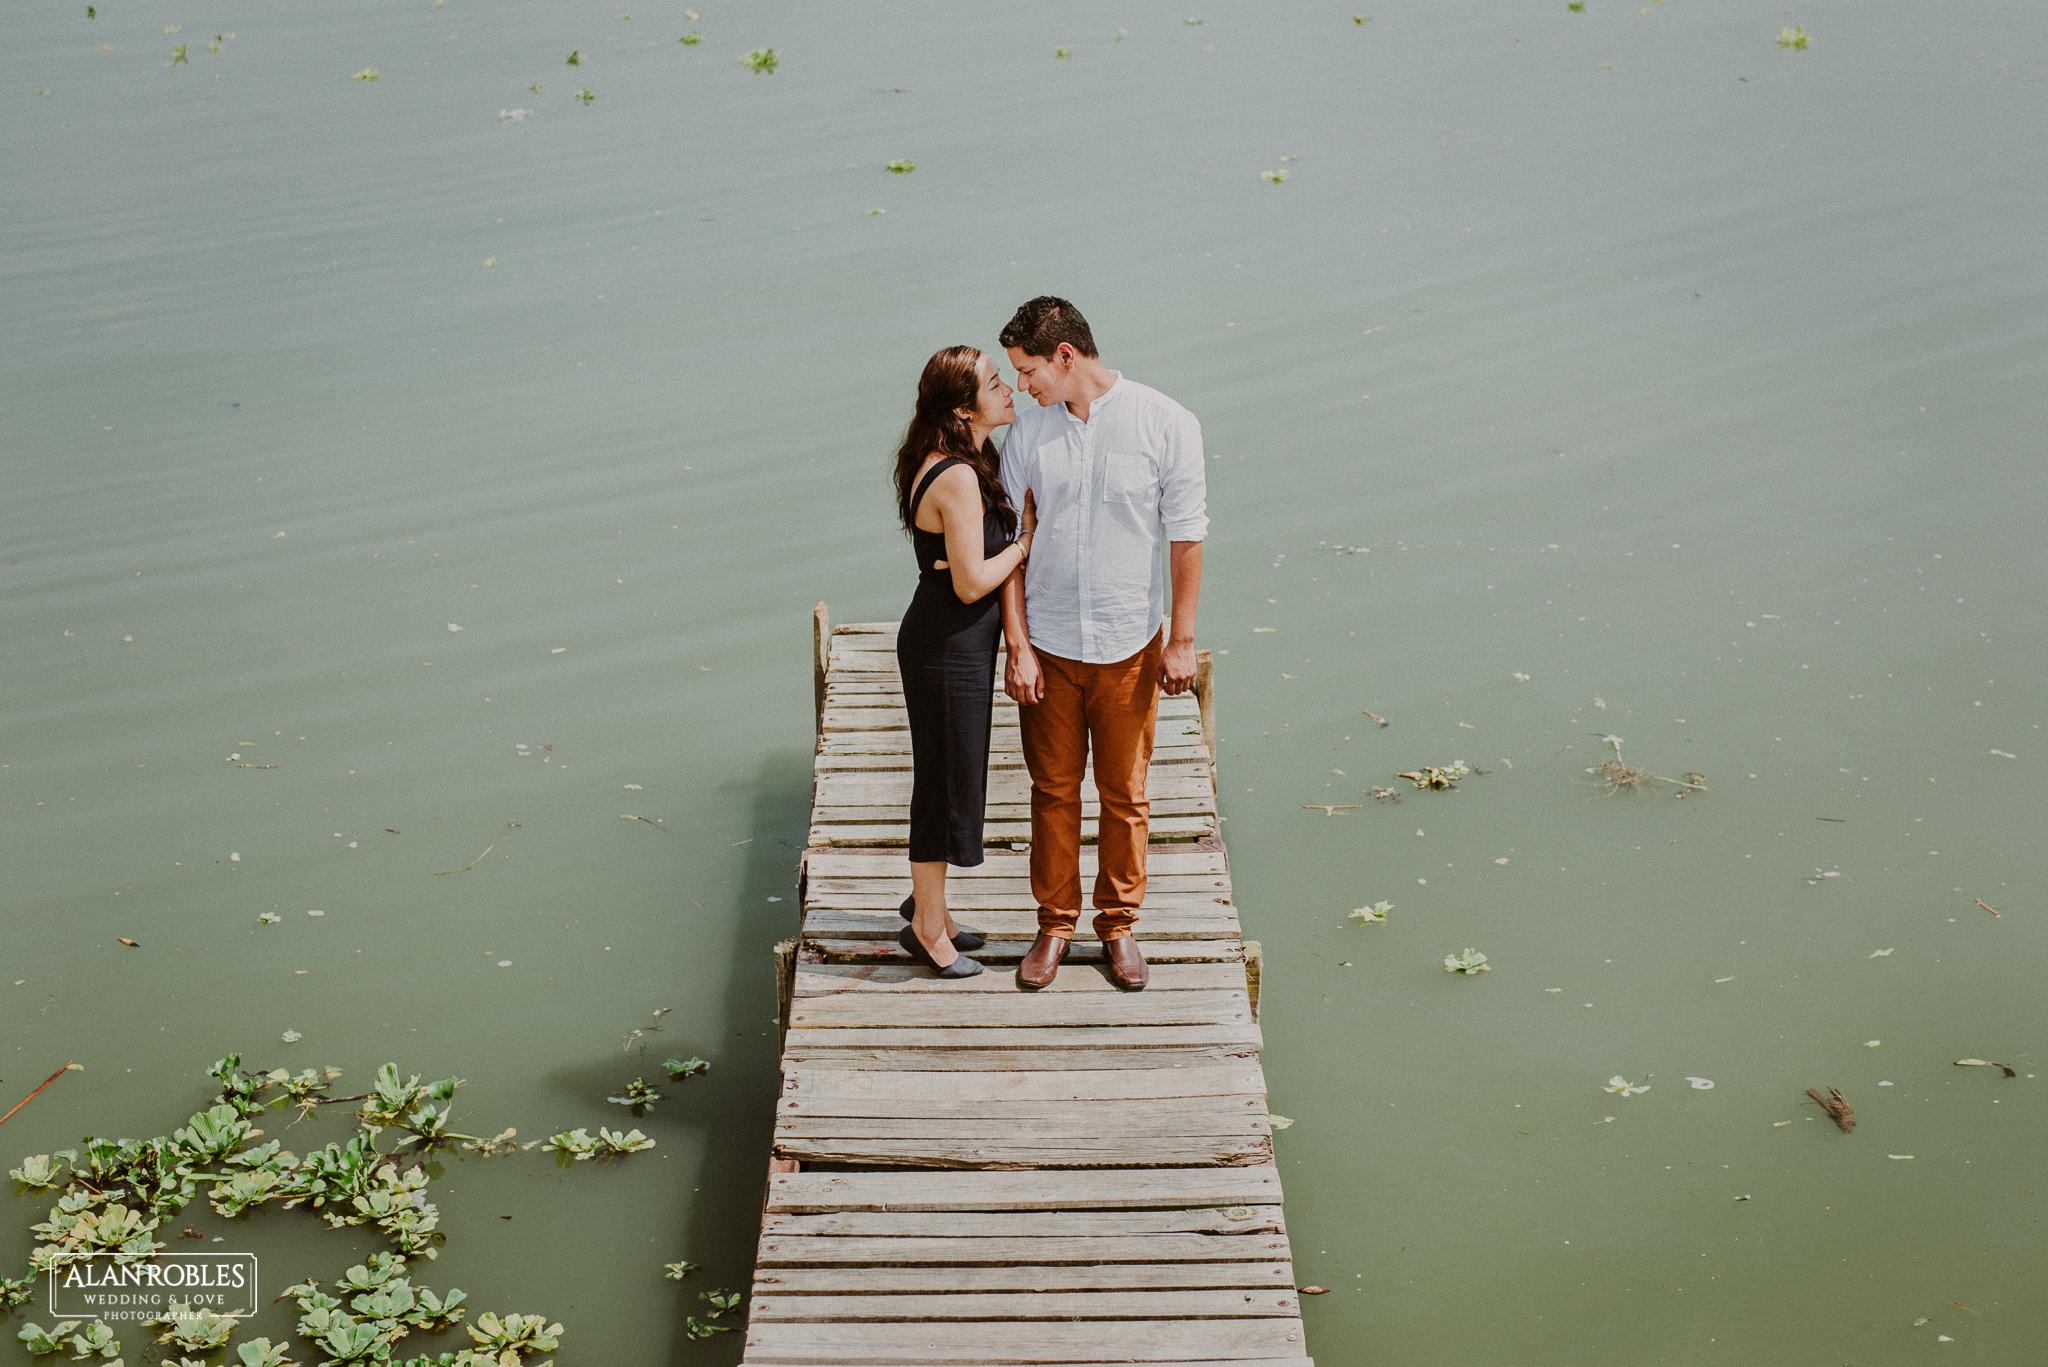 Sesion de fotos Preboda en Laguna de Chapala, Ajijic. Fotografia de bodas - Alan Robles Wedding & Love Photographer, Fotografo de bodas en Guadalajara. Muelle en lago, fotos creativas para boda. Ideas para fotos de boda. Amor en muelle de Chapala.